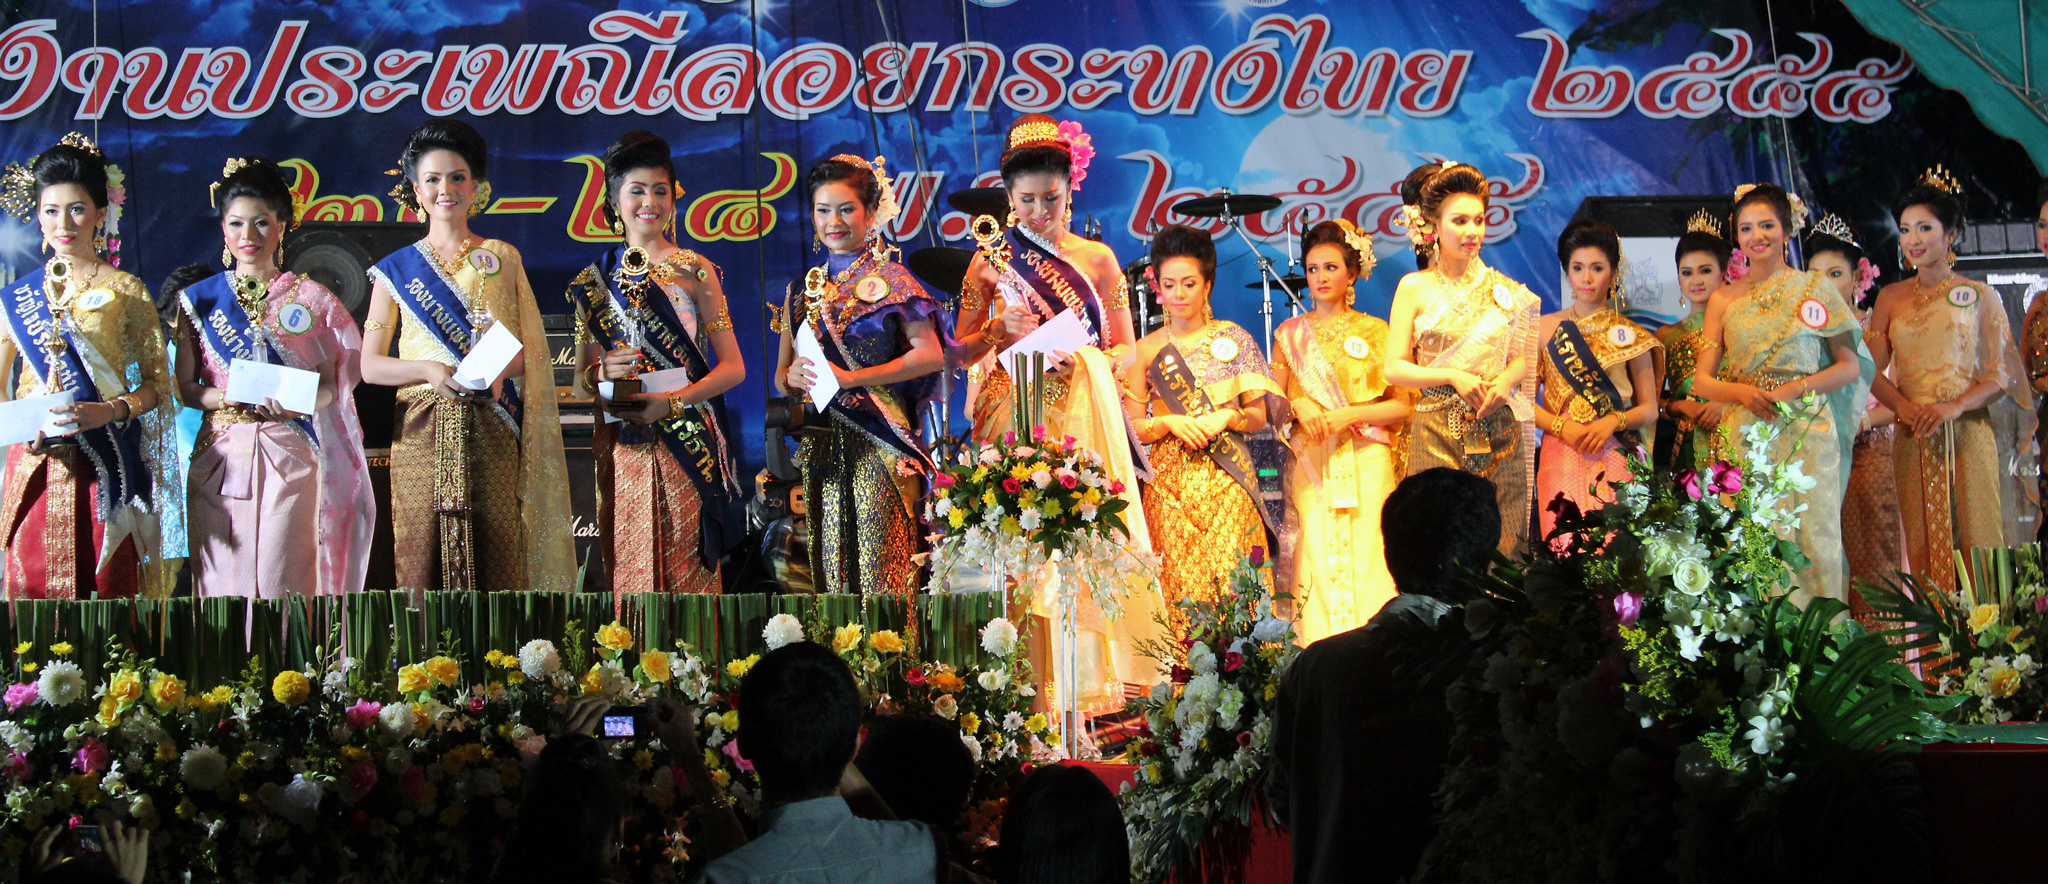 18c28147c9 Traditional Thai clothing - Wikipedia